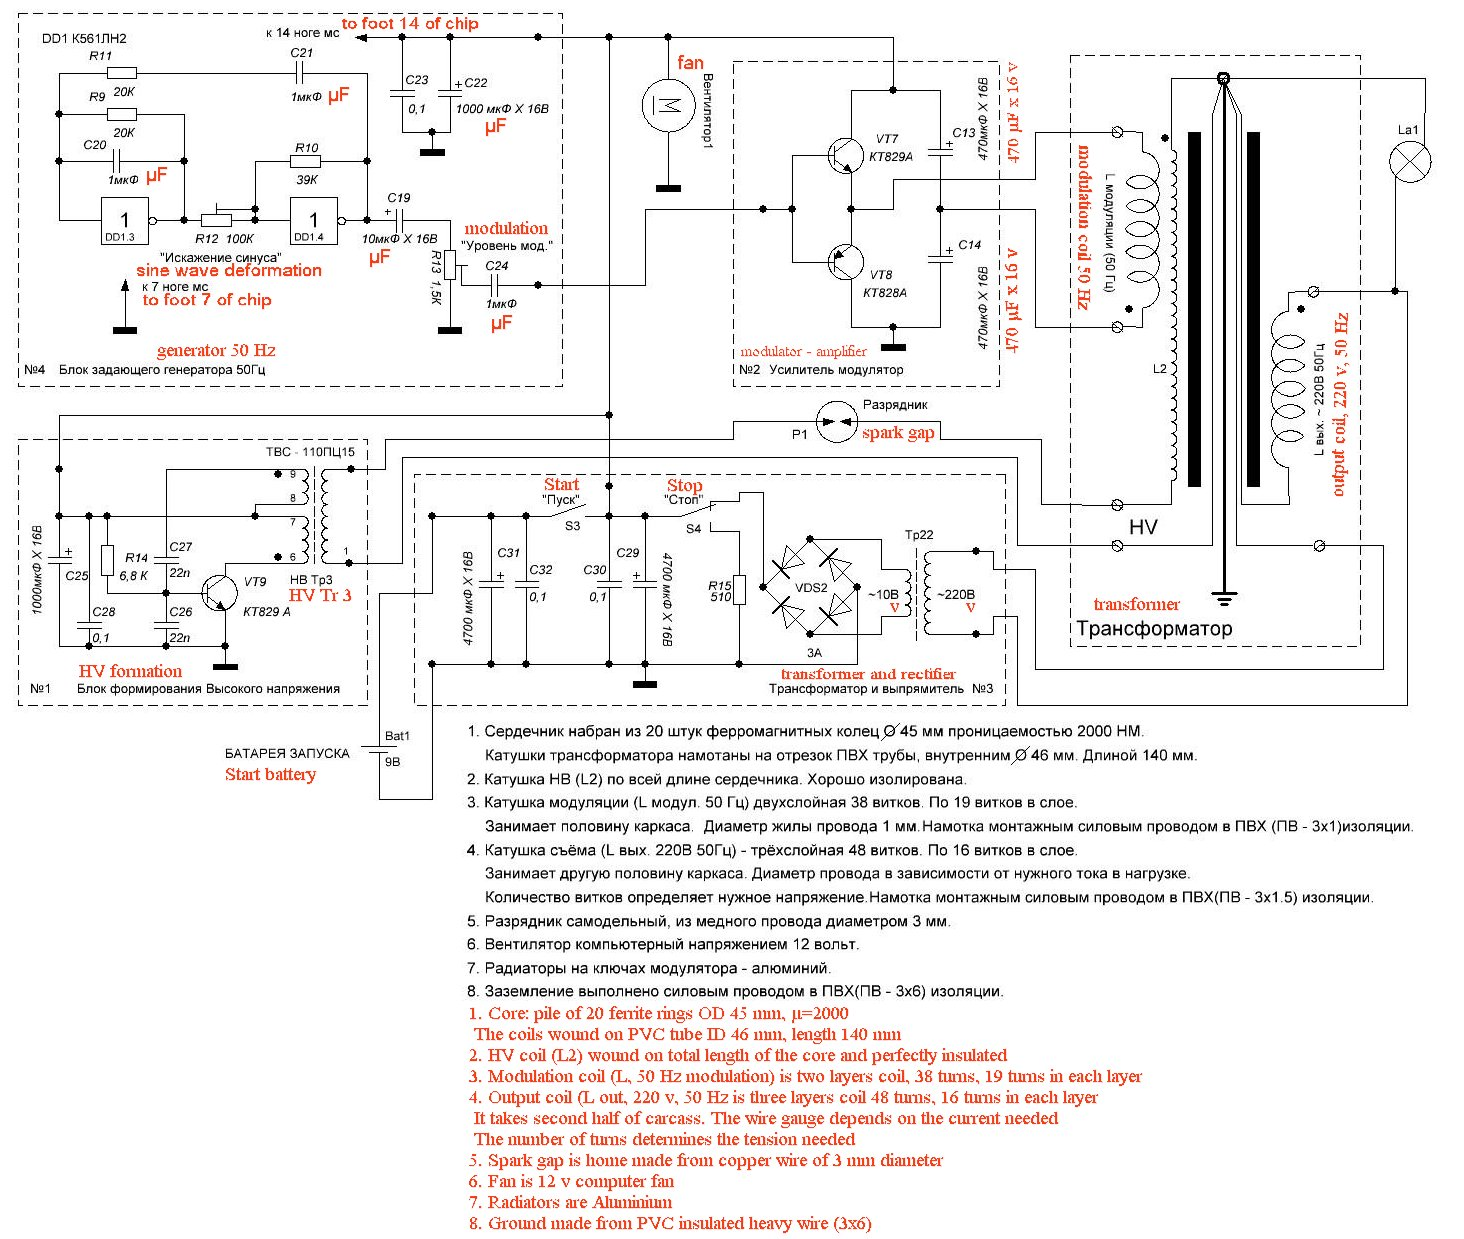 Free Energy Kapanadze Free Energy Generator Schematics